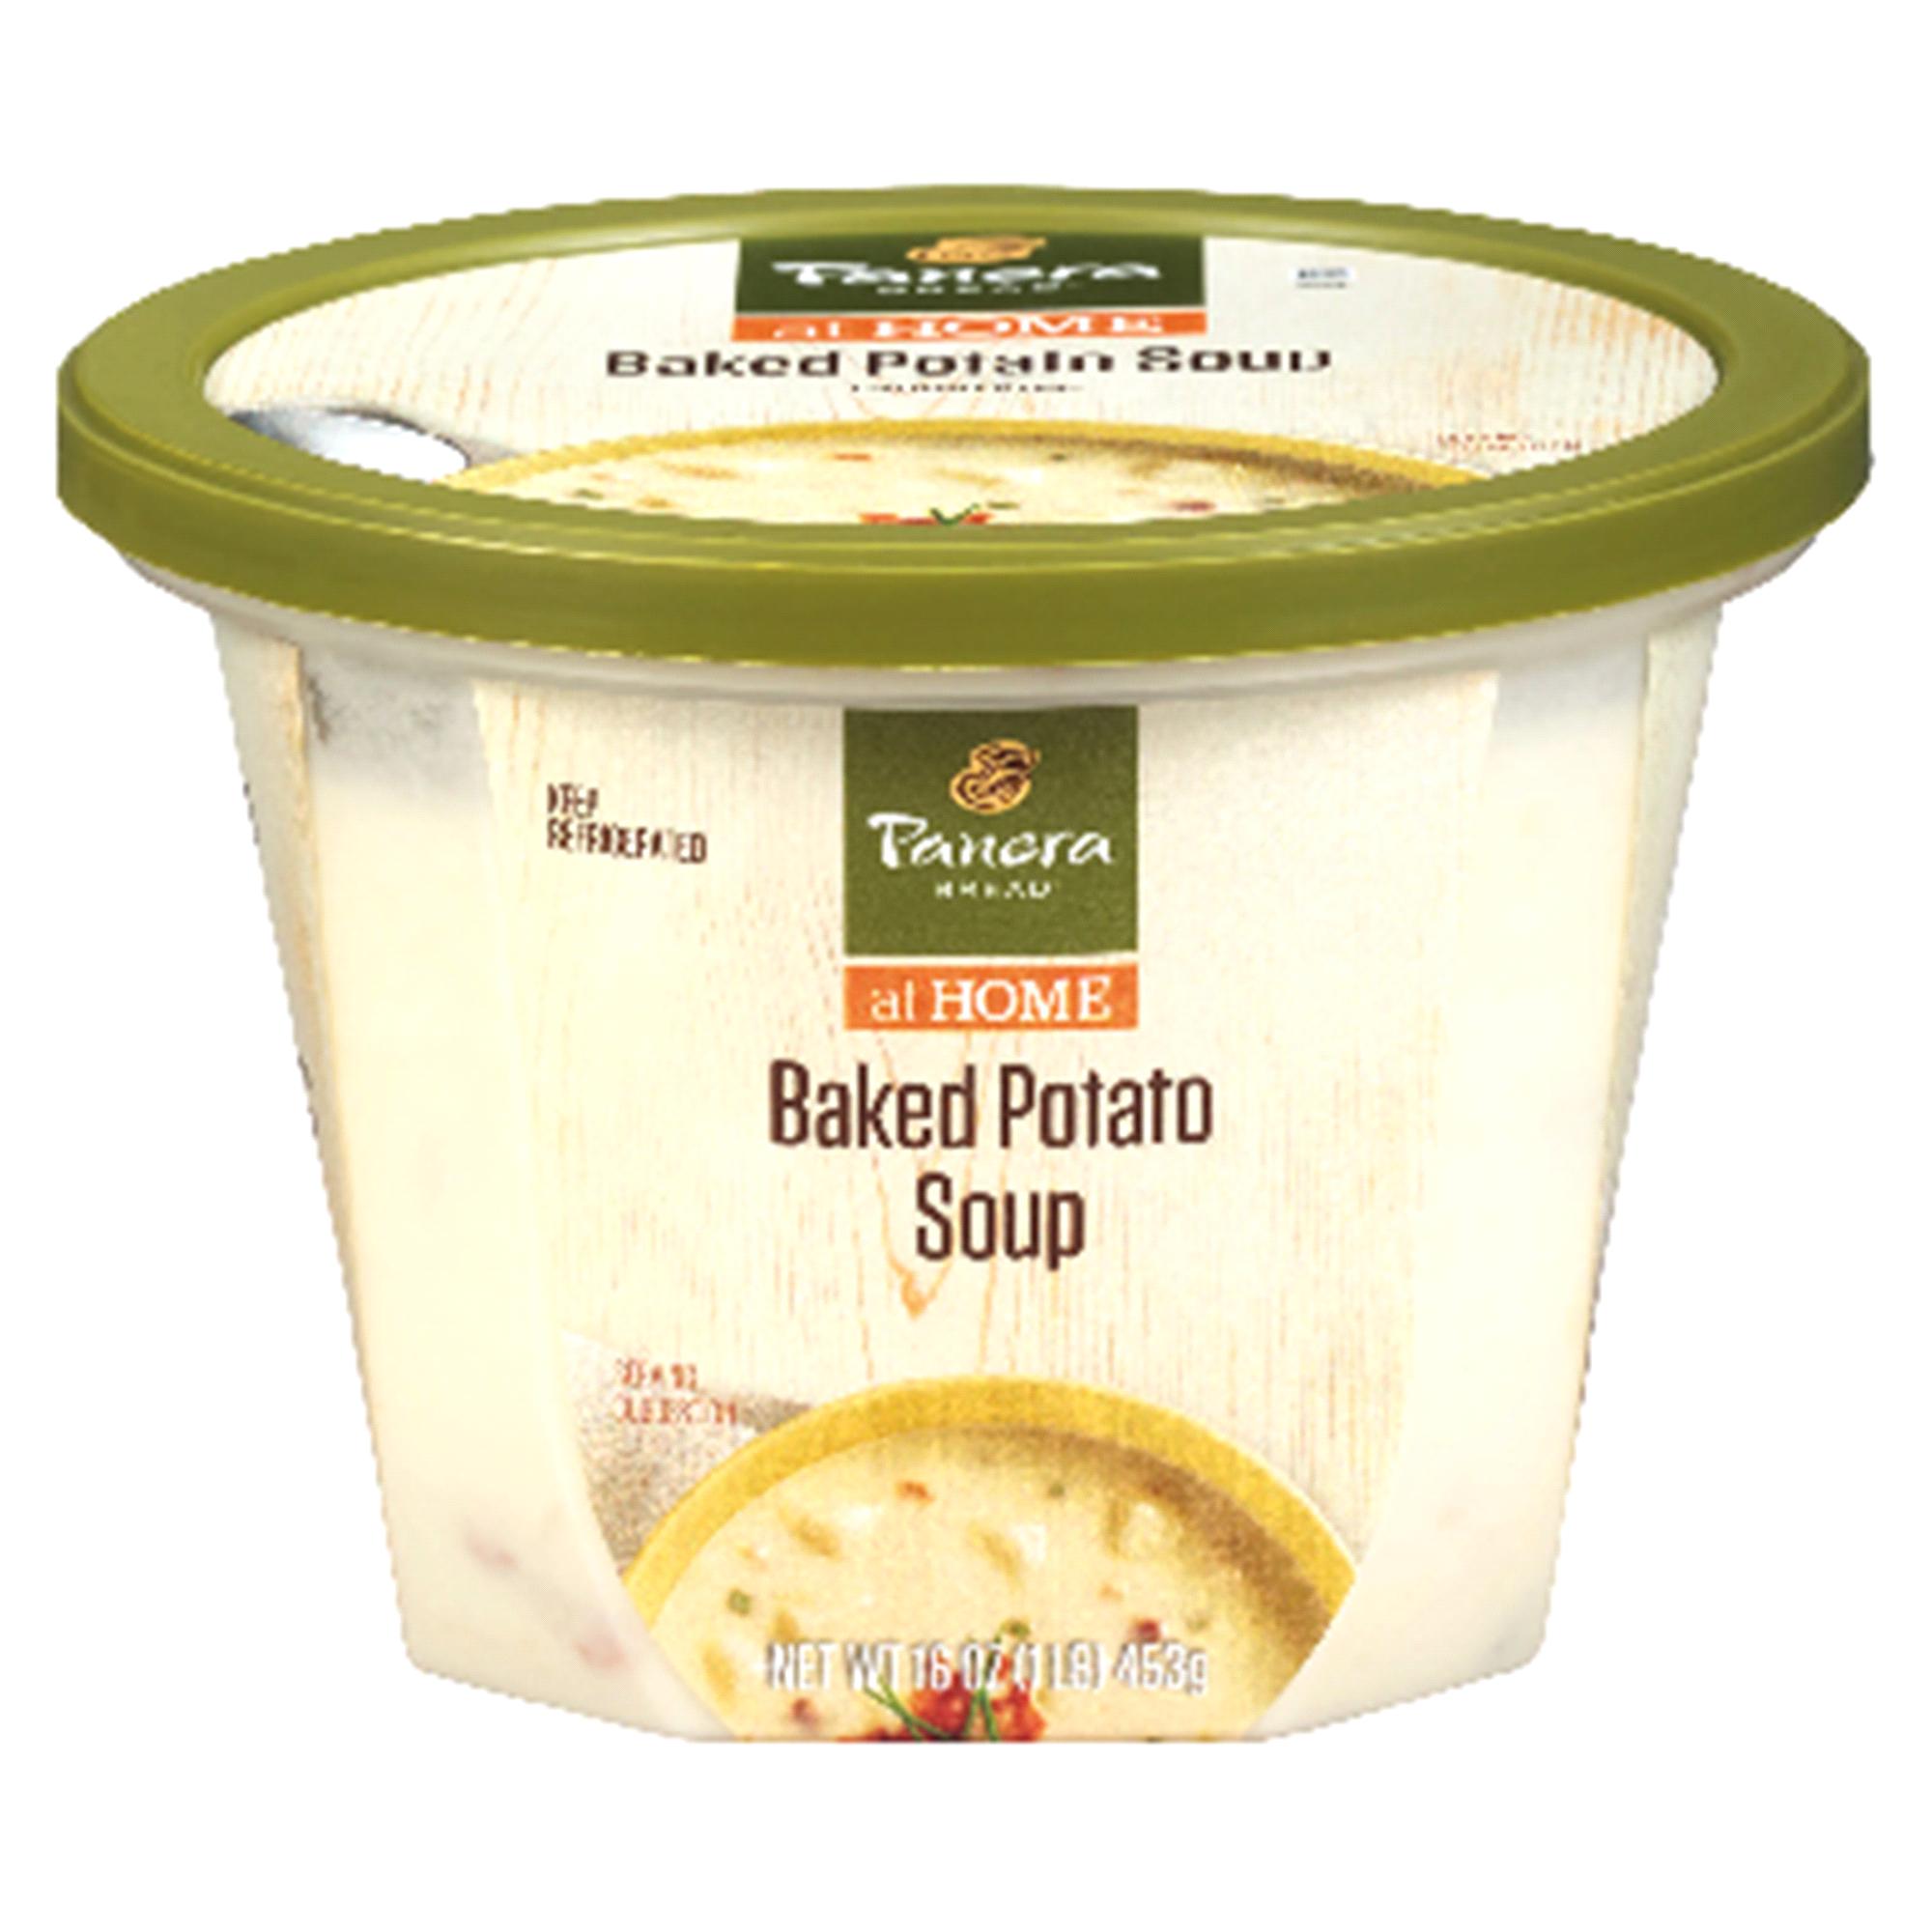 Panera Bread Soup Baked Potato 16 oz | Meijer.com